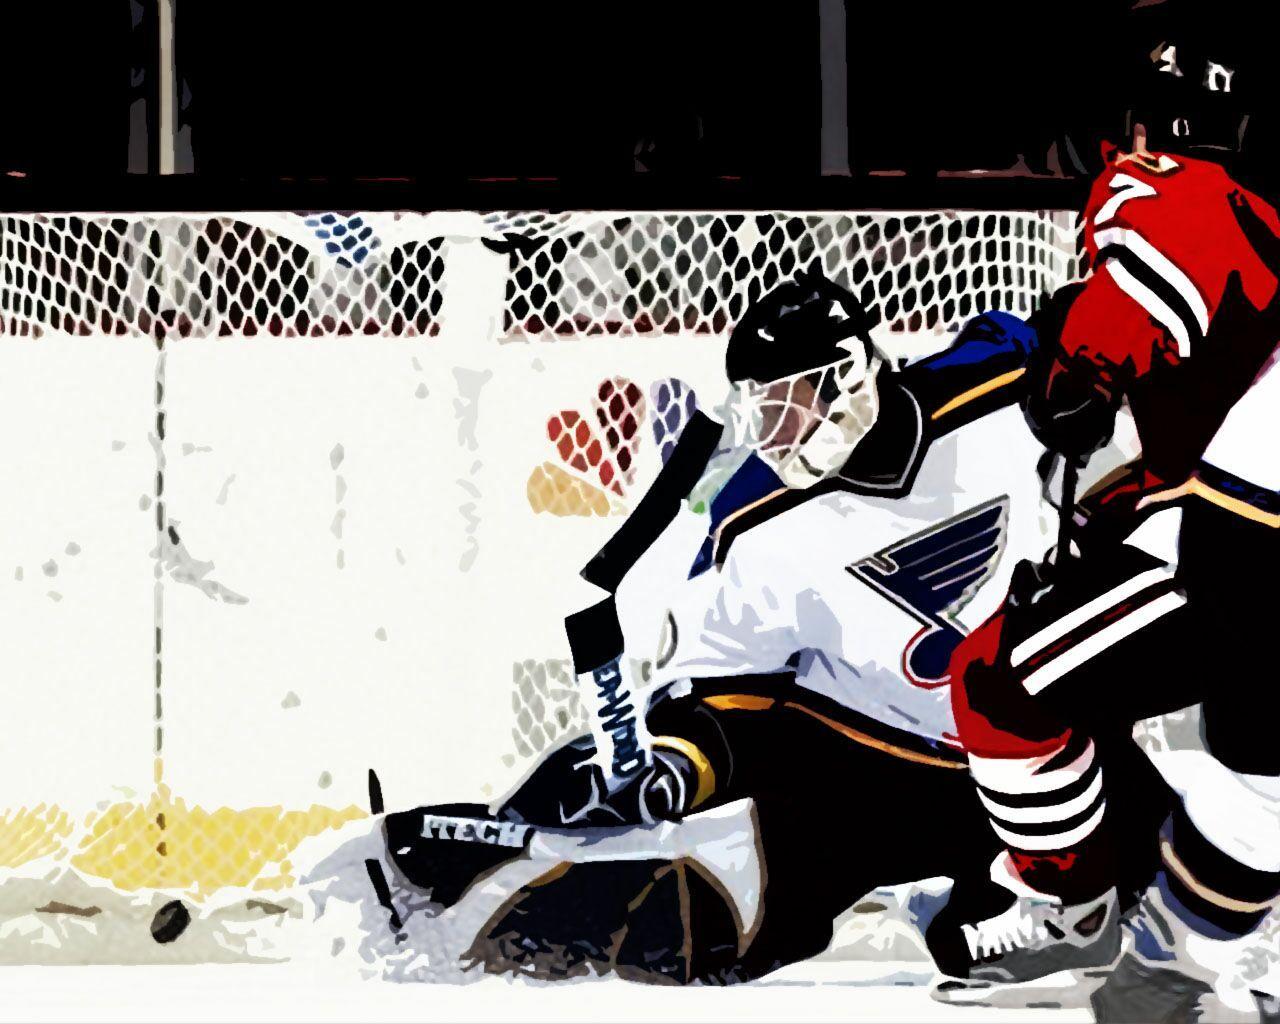 Hockey Wallpaper Hd wallpaper wallpaper hd background desktop 1280x1024